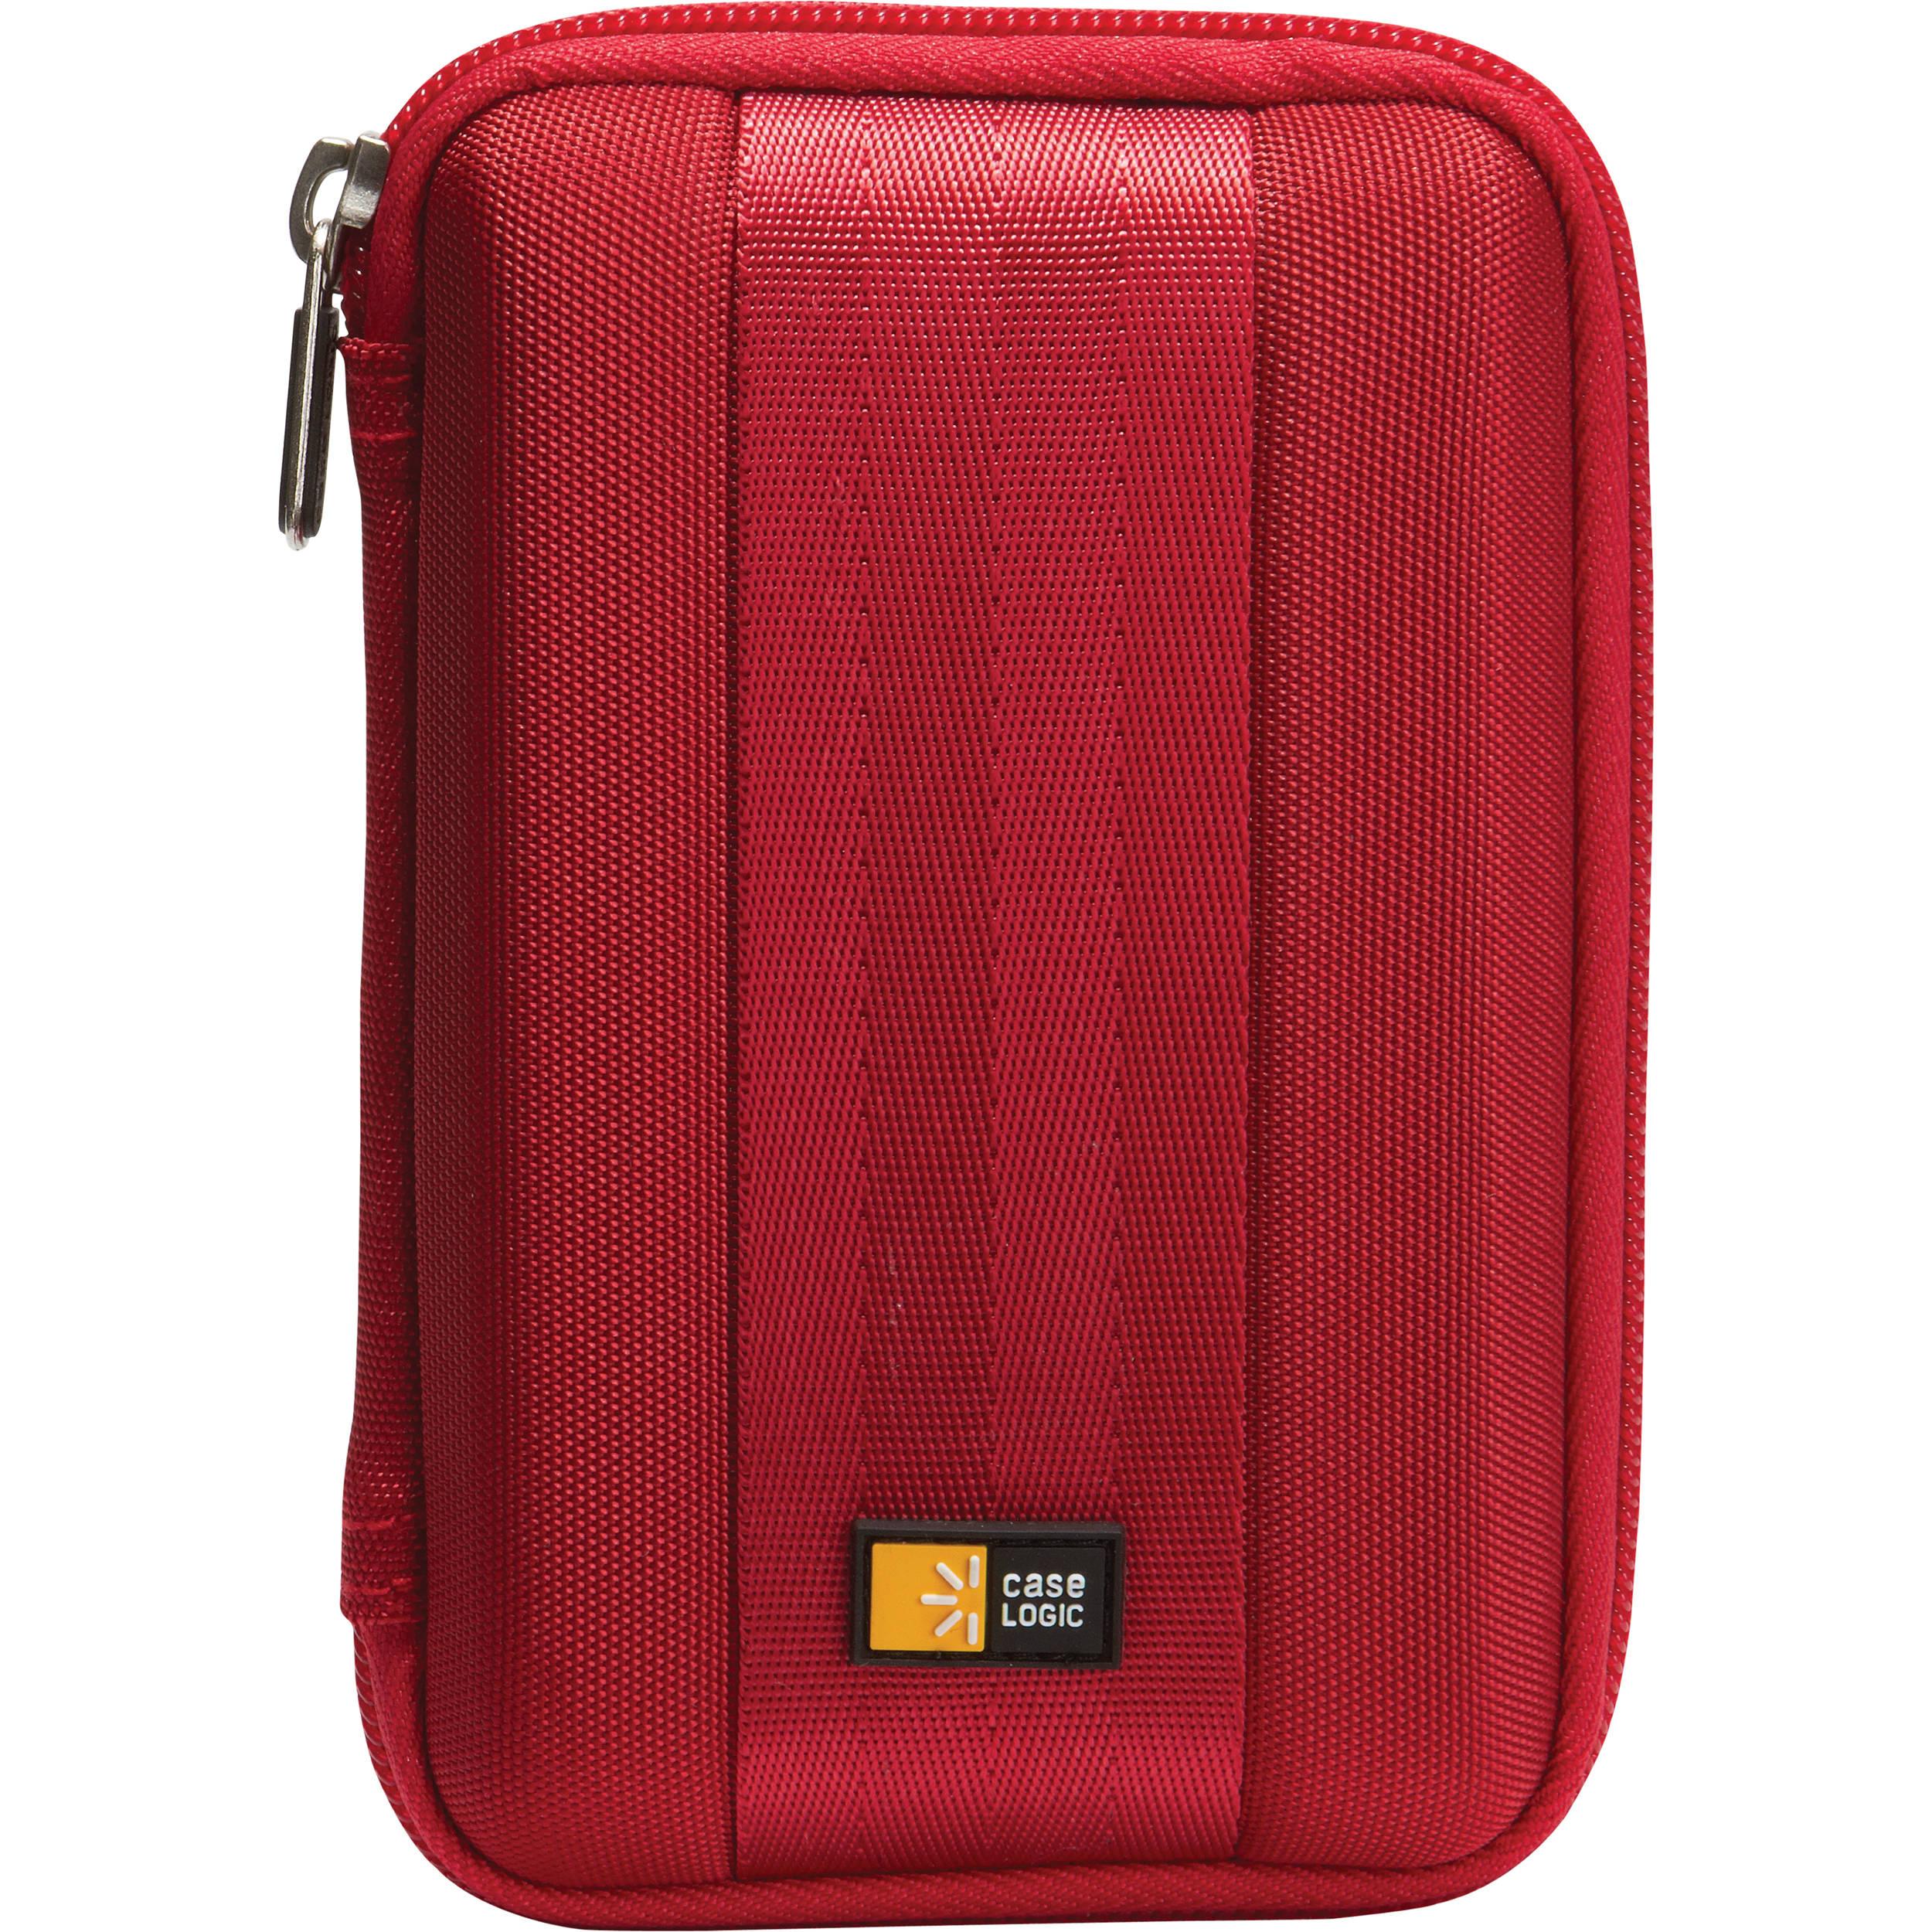 Case logic qhdc 101 portable hard drive case red qhdc 101 r for Housse case logic